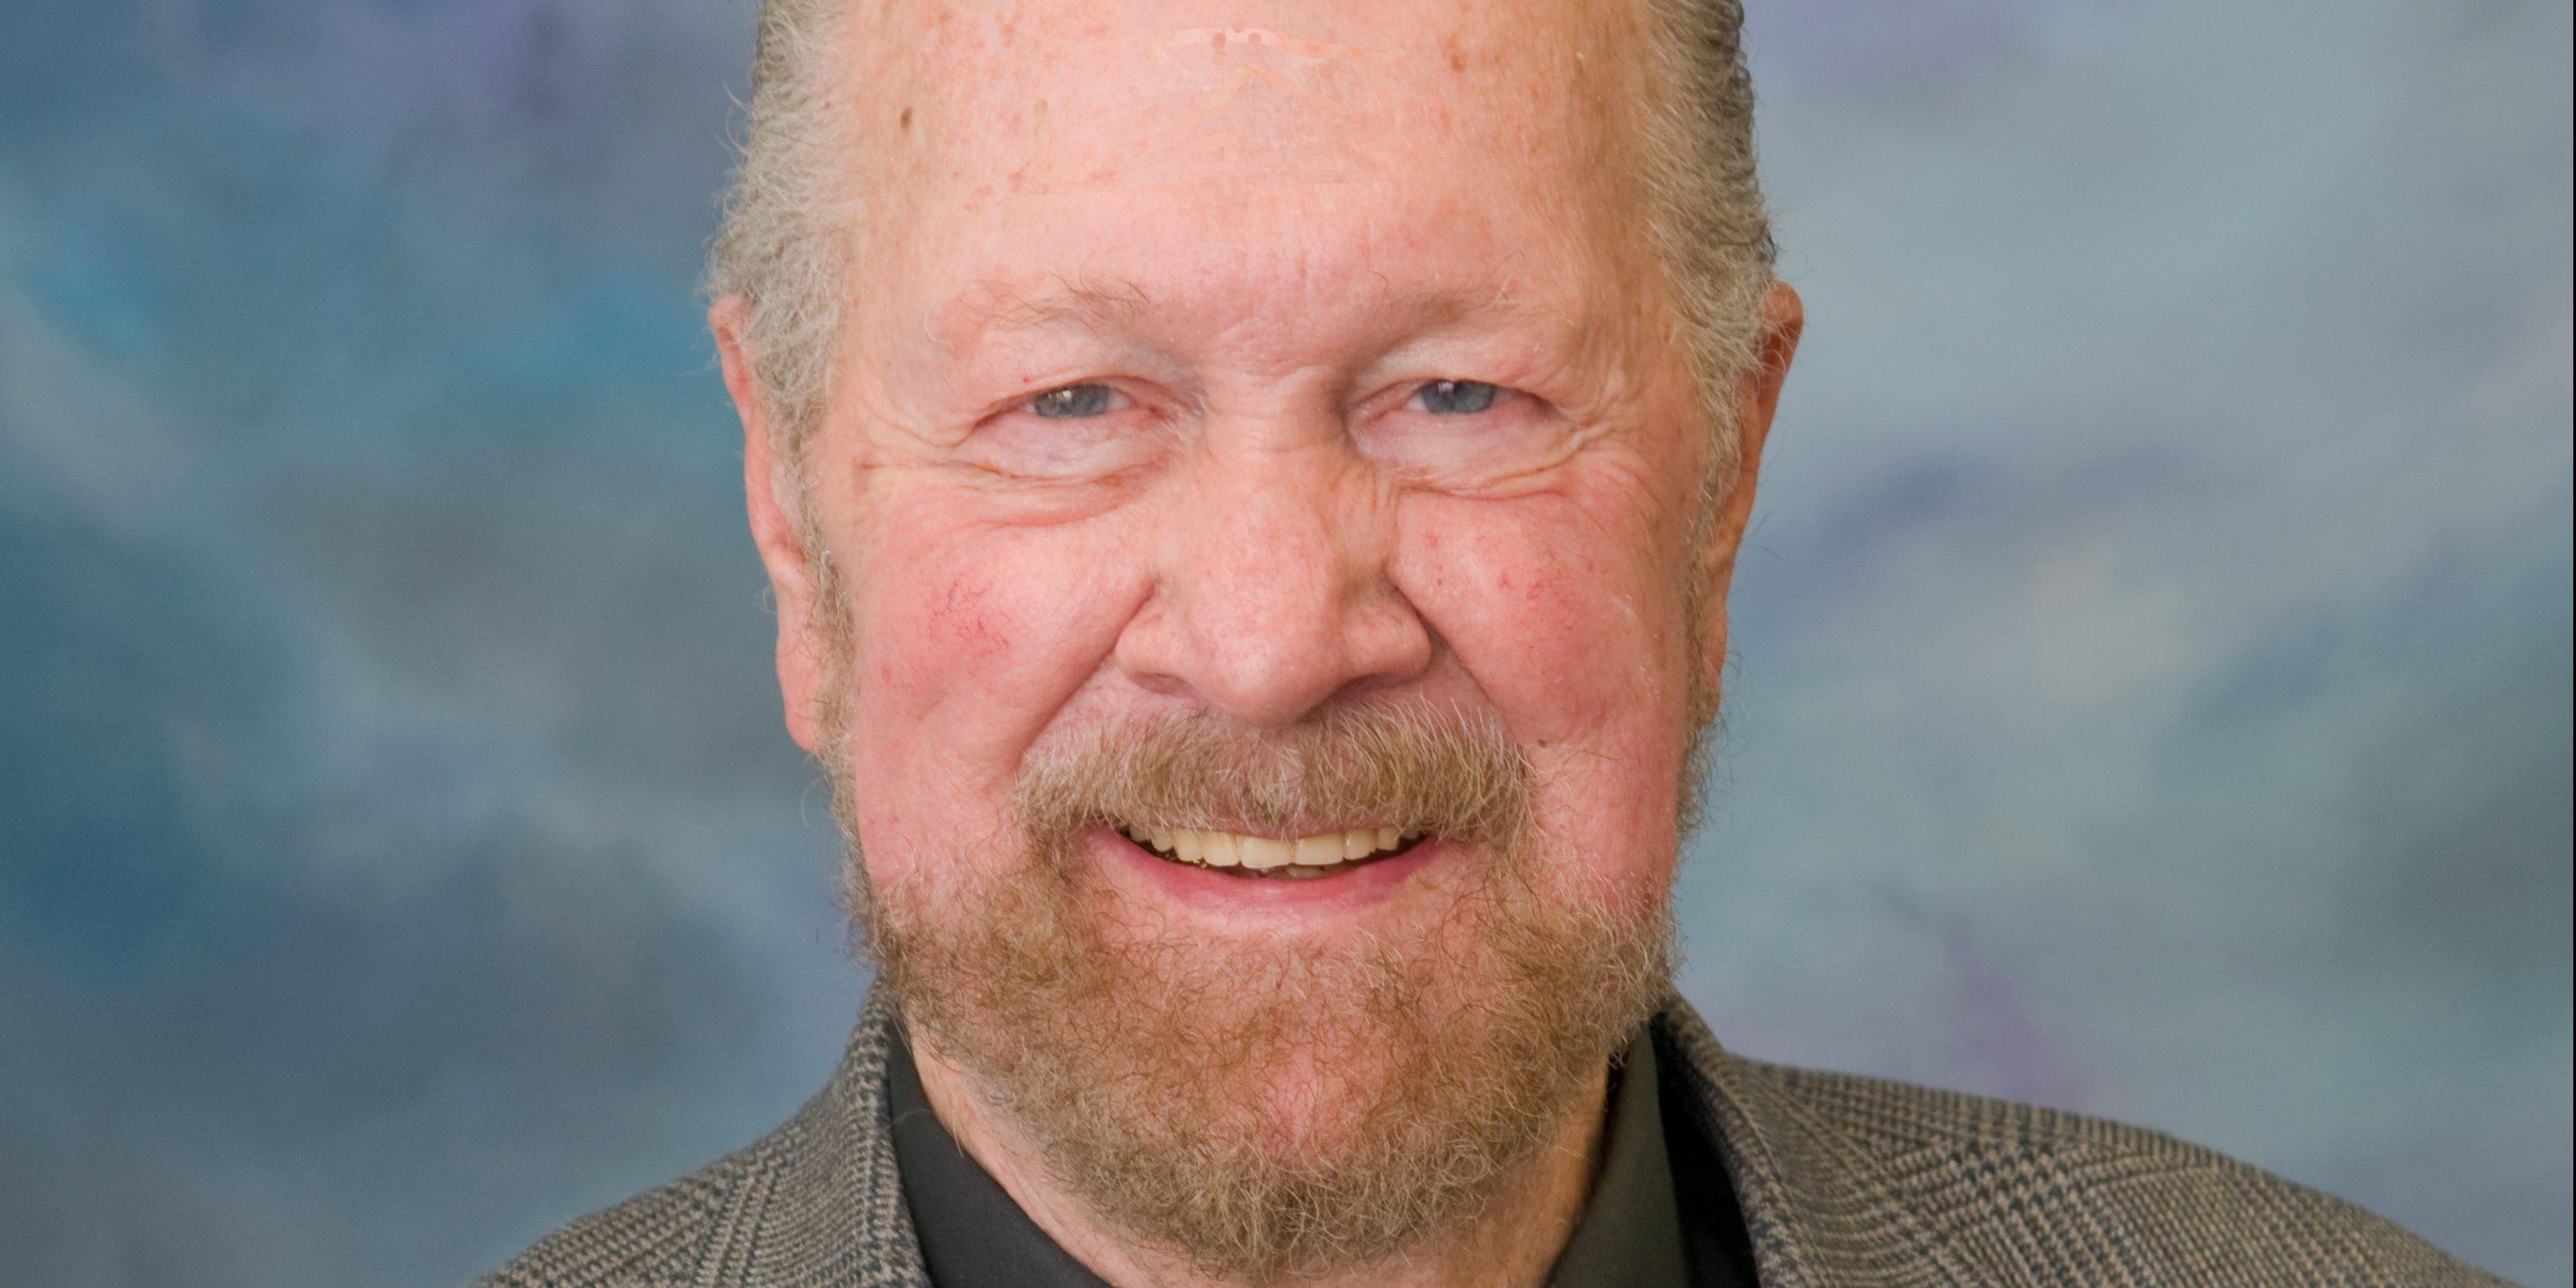 Long-time pro-life activist Joe Scheidler dies at 93